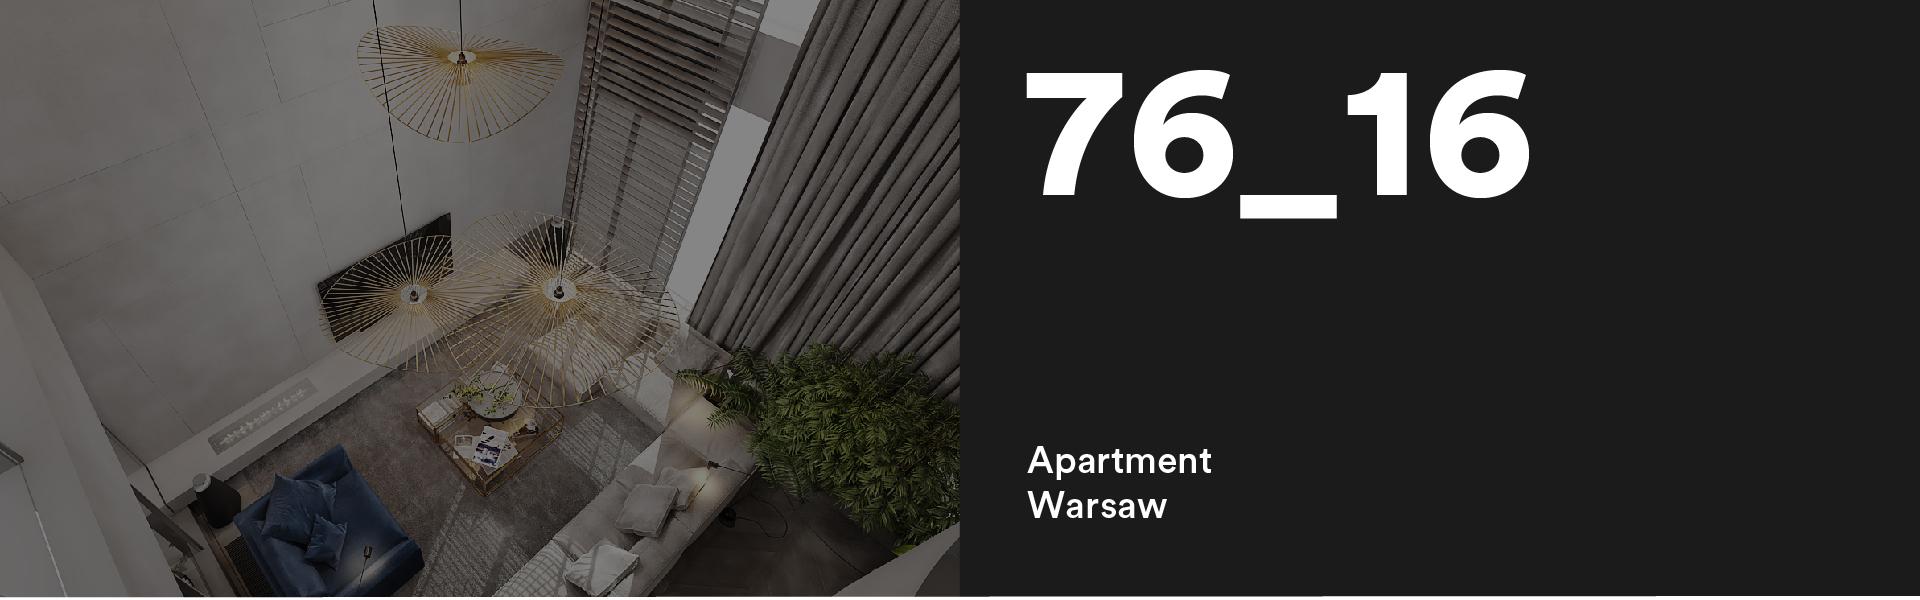 76_16 Apartment Zlota